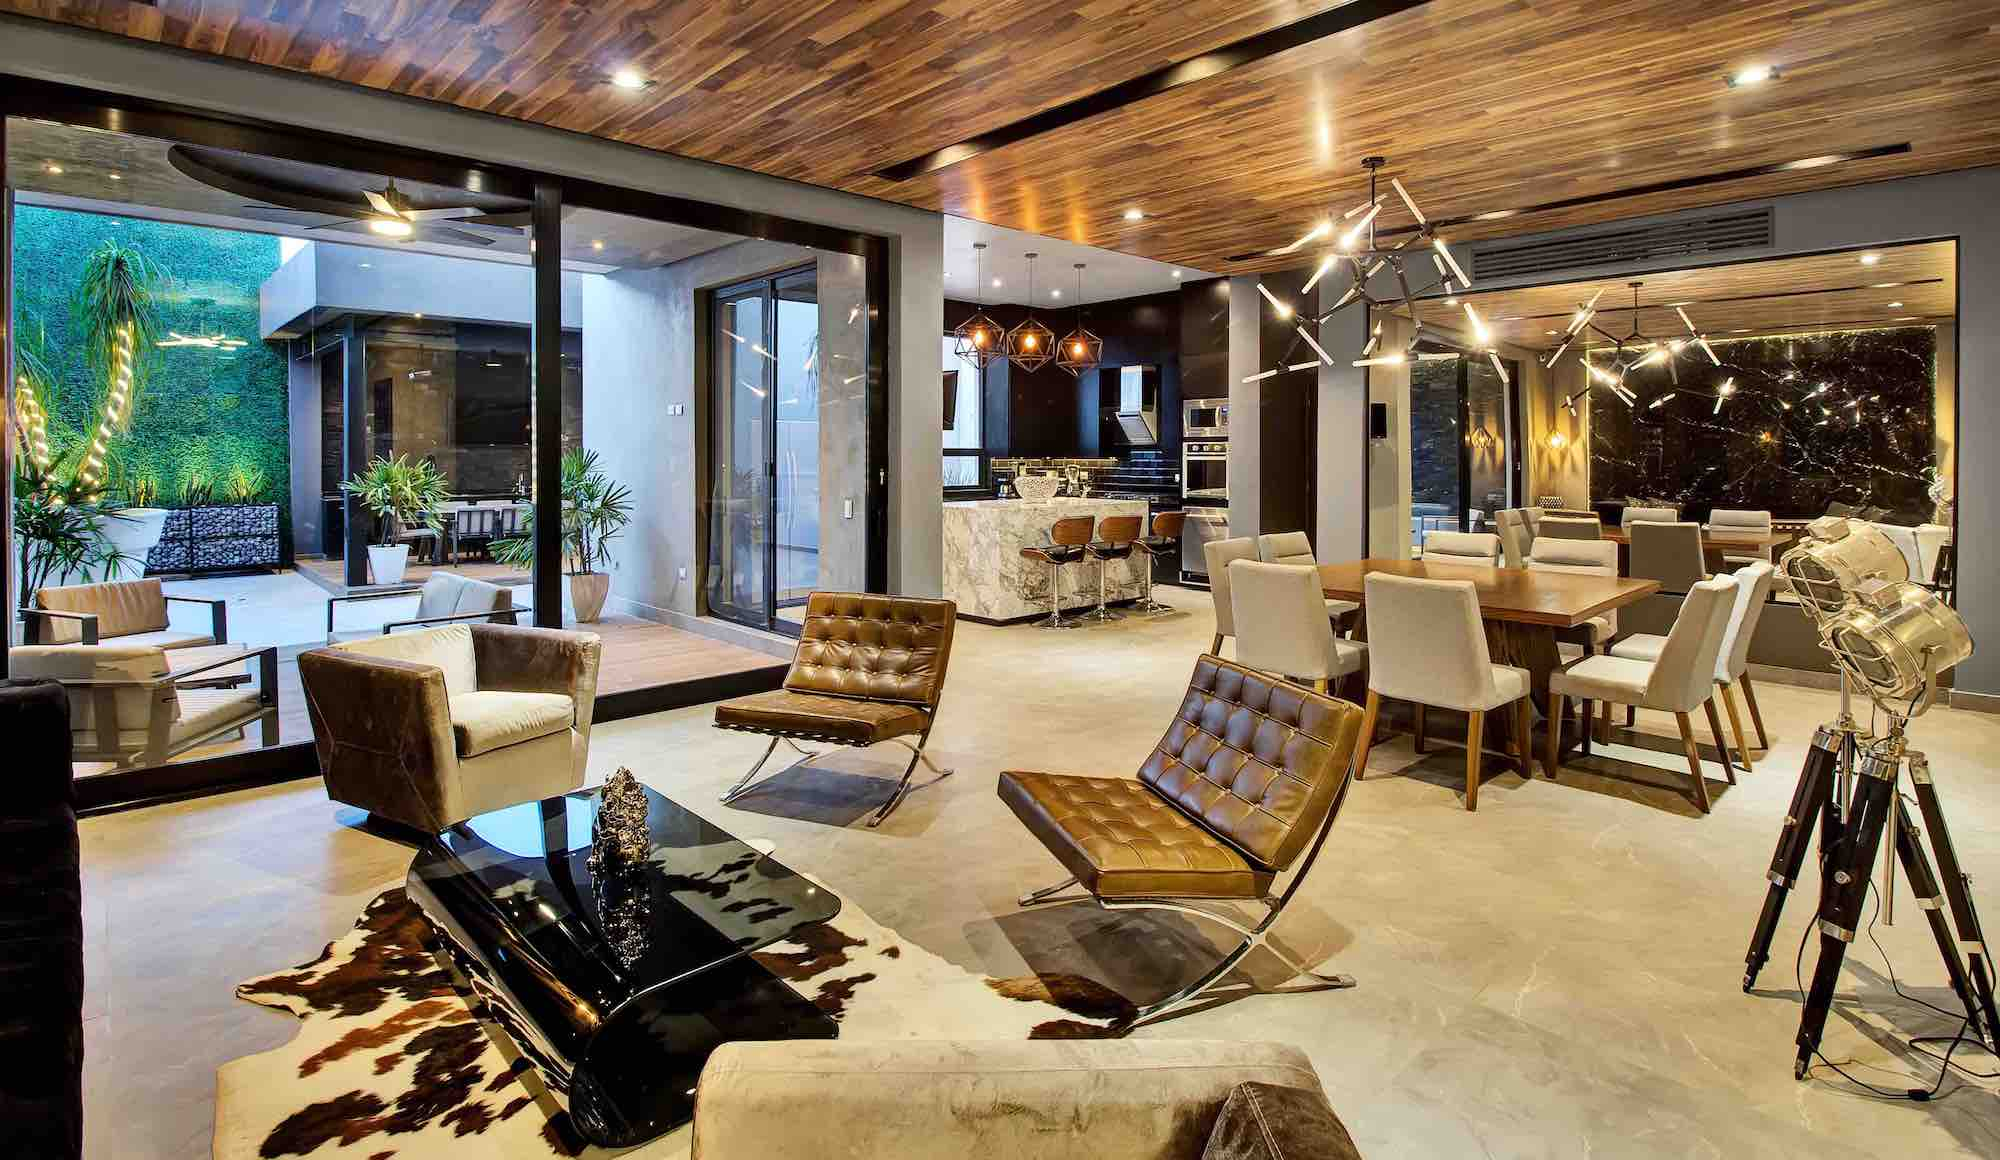 GR_House_Gallardo_arquitectura_amazingarchitecture_mexico_009.jpg